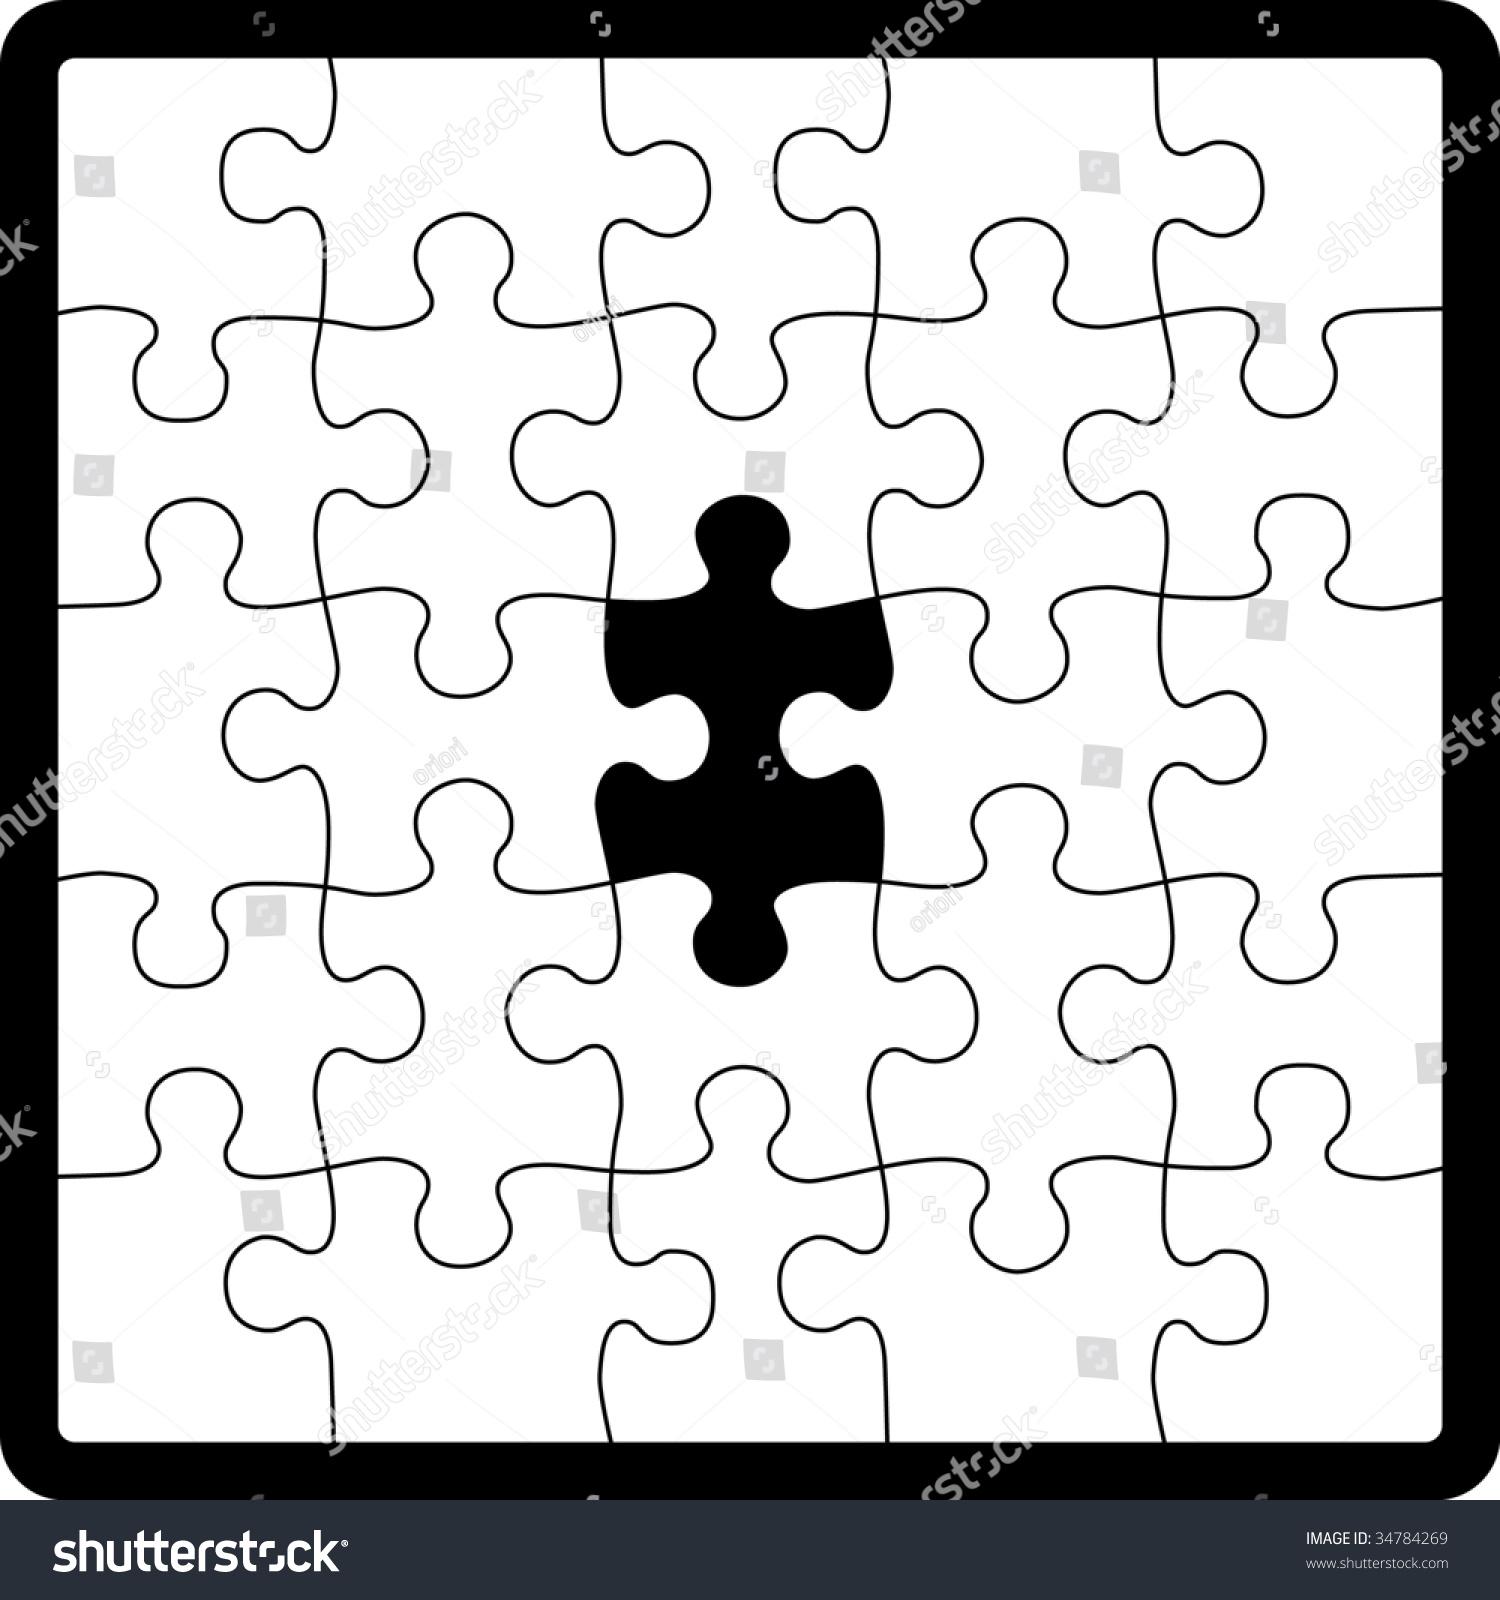 Puzzle Shape Stock Vector 34784269 - Shutterstock